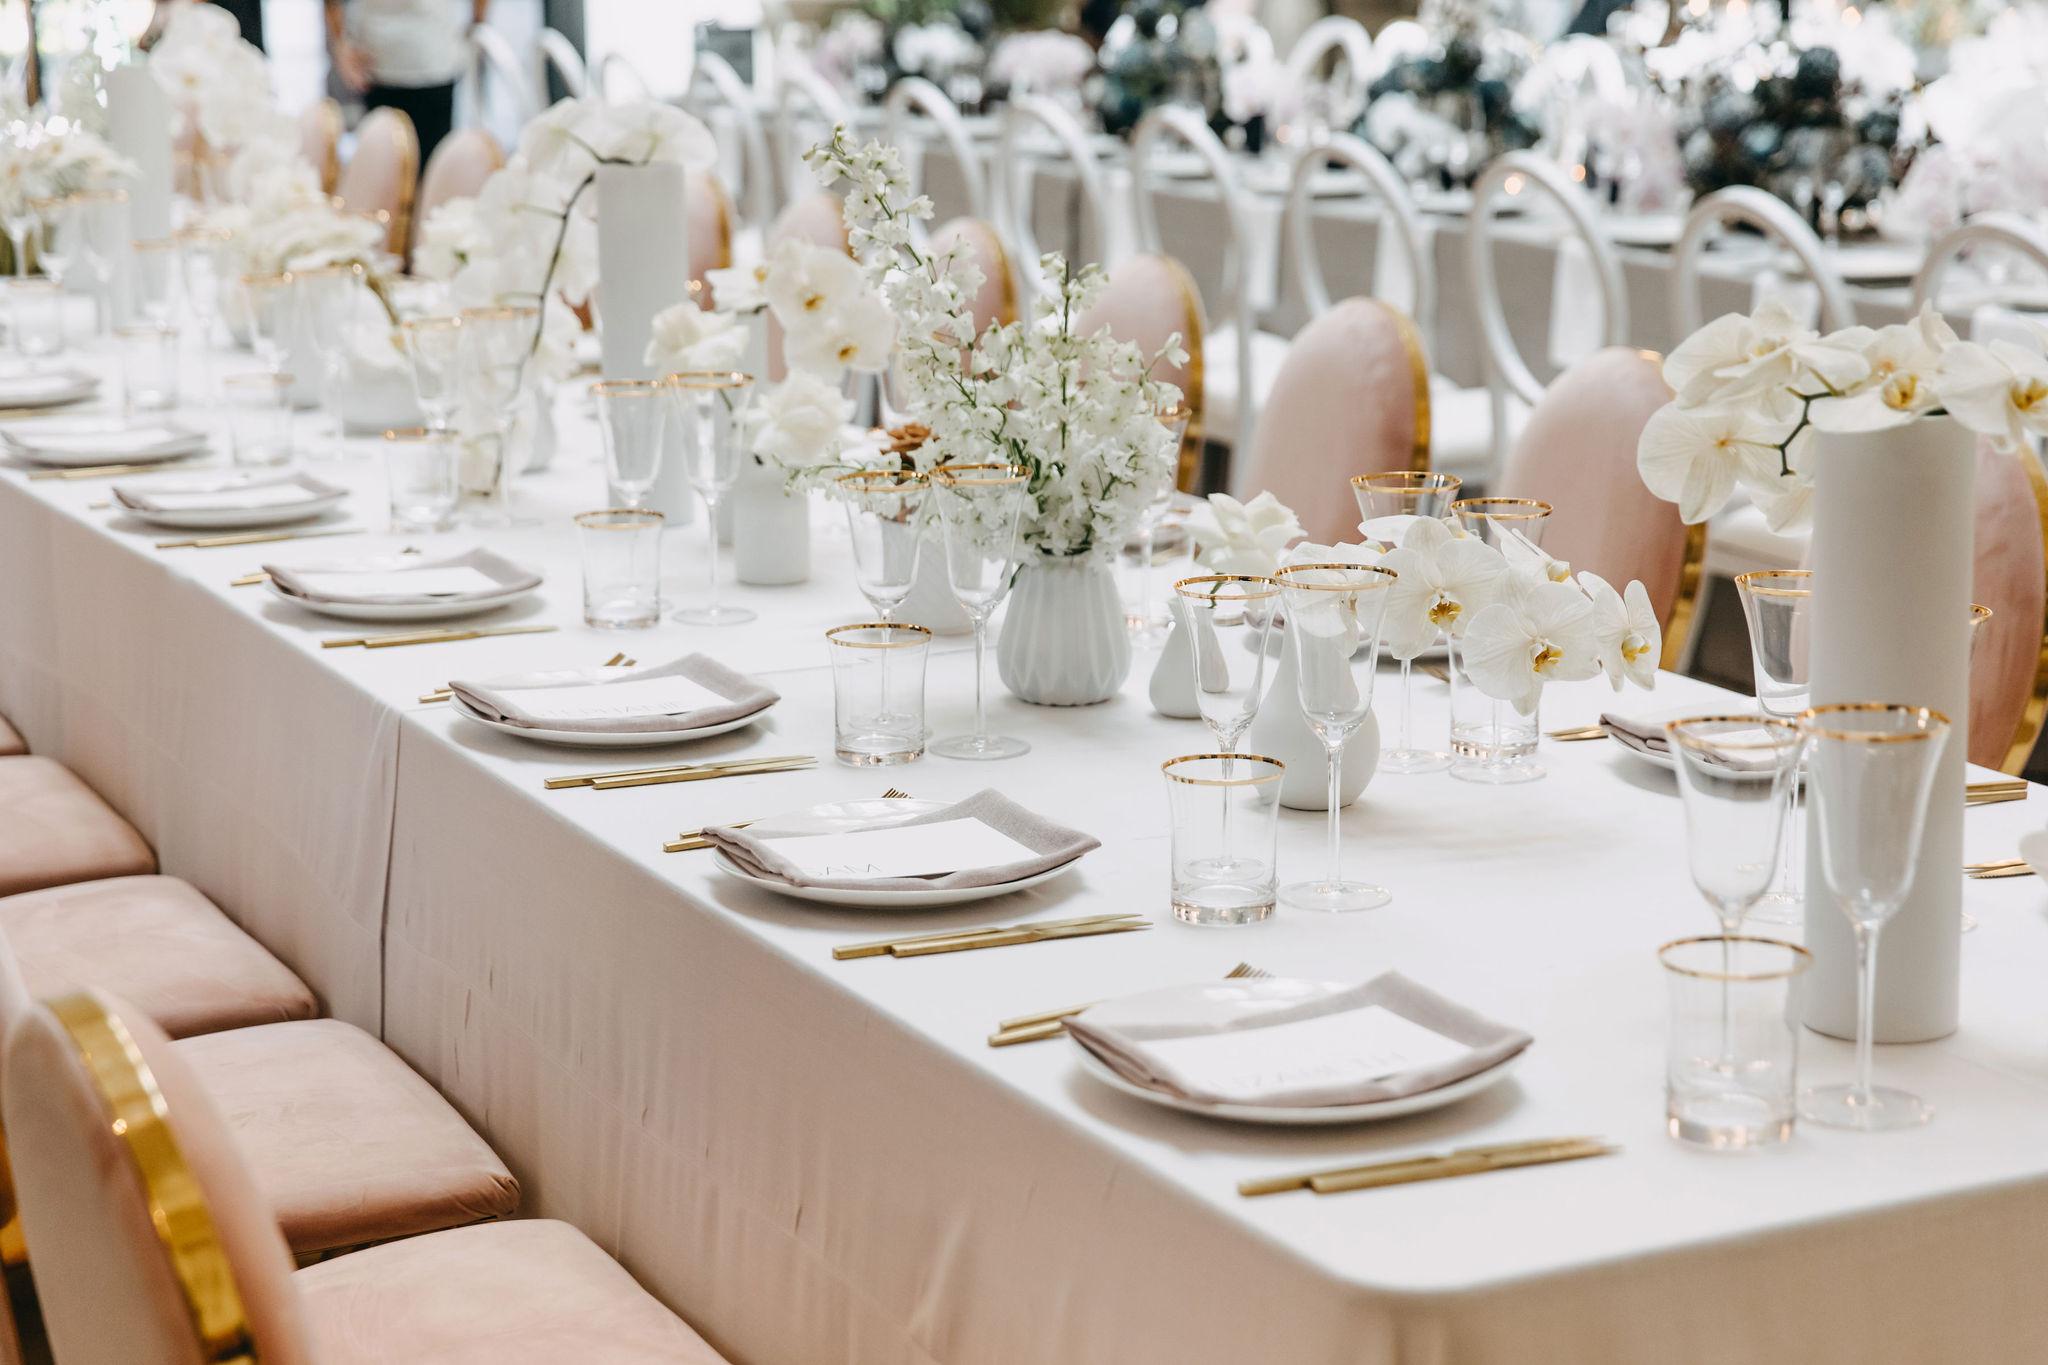 STATEBUILDINGS-WEDDINGOPENDAY-2019_SUPPLIED_036